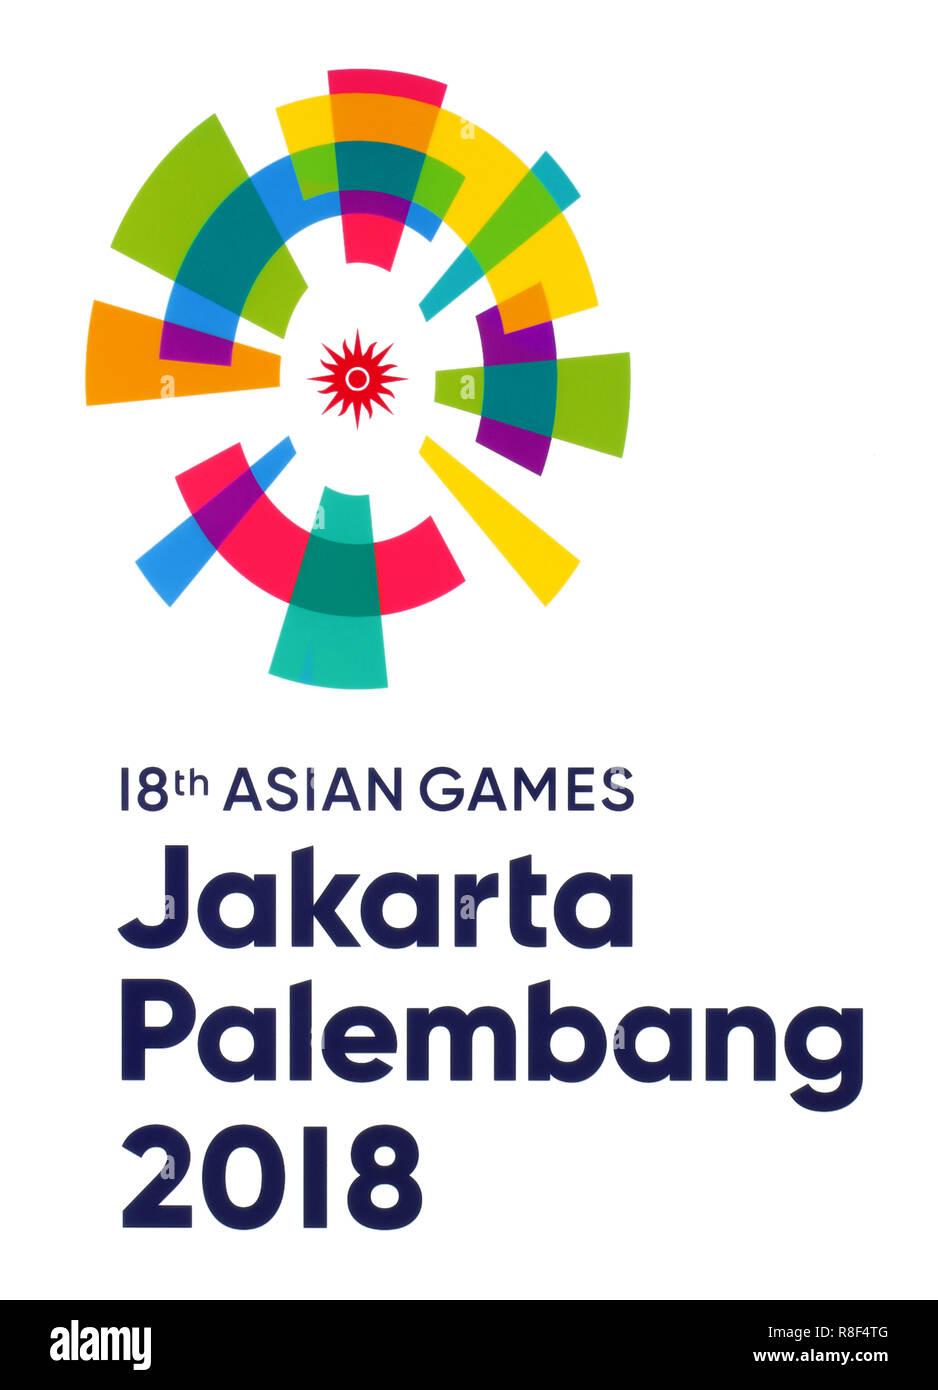 Kiev, Ukraine - October 09, 2018: The 18th Asian Games emblem printed on paper, Jakarta–Palembang 2018, was a pan-Asian multi-sport event. - Stock Image